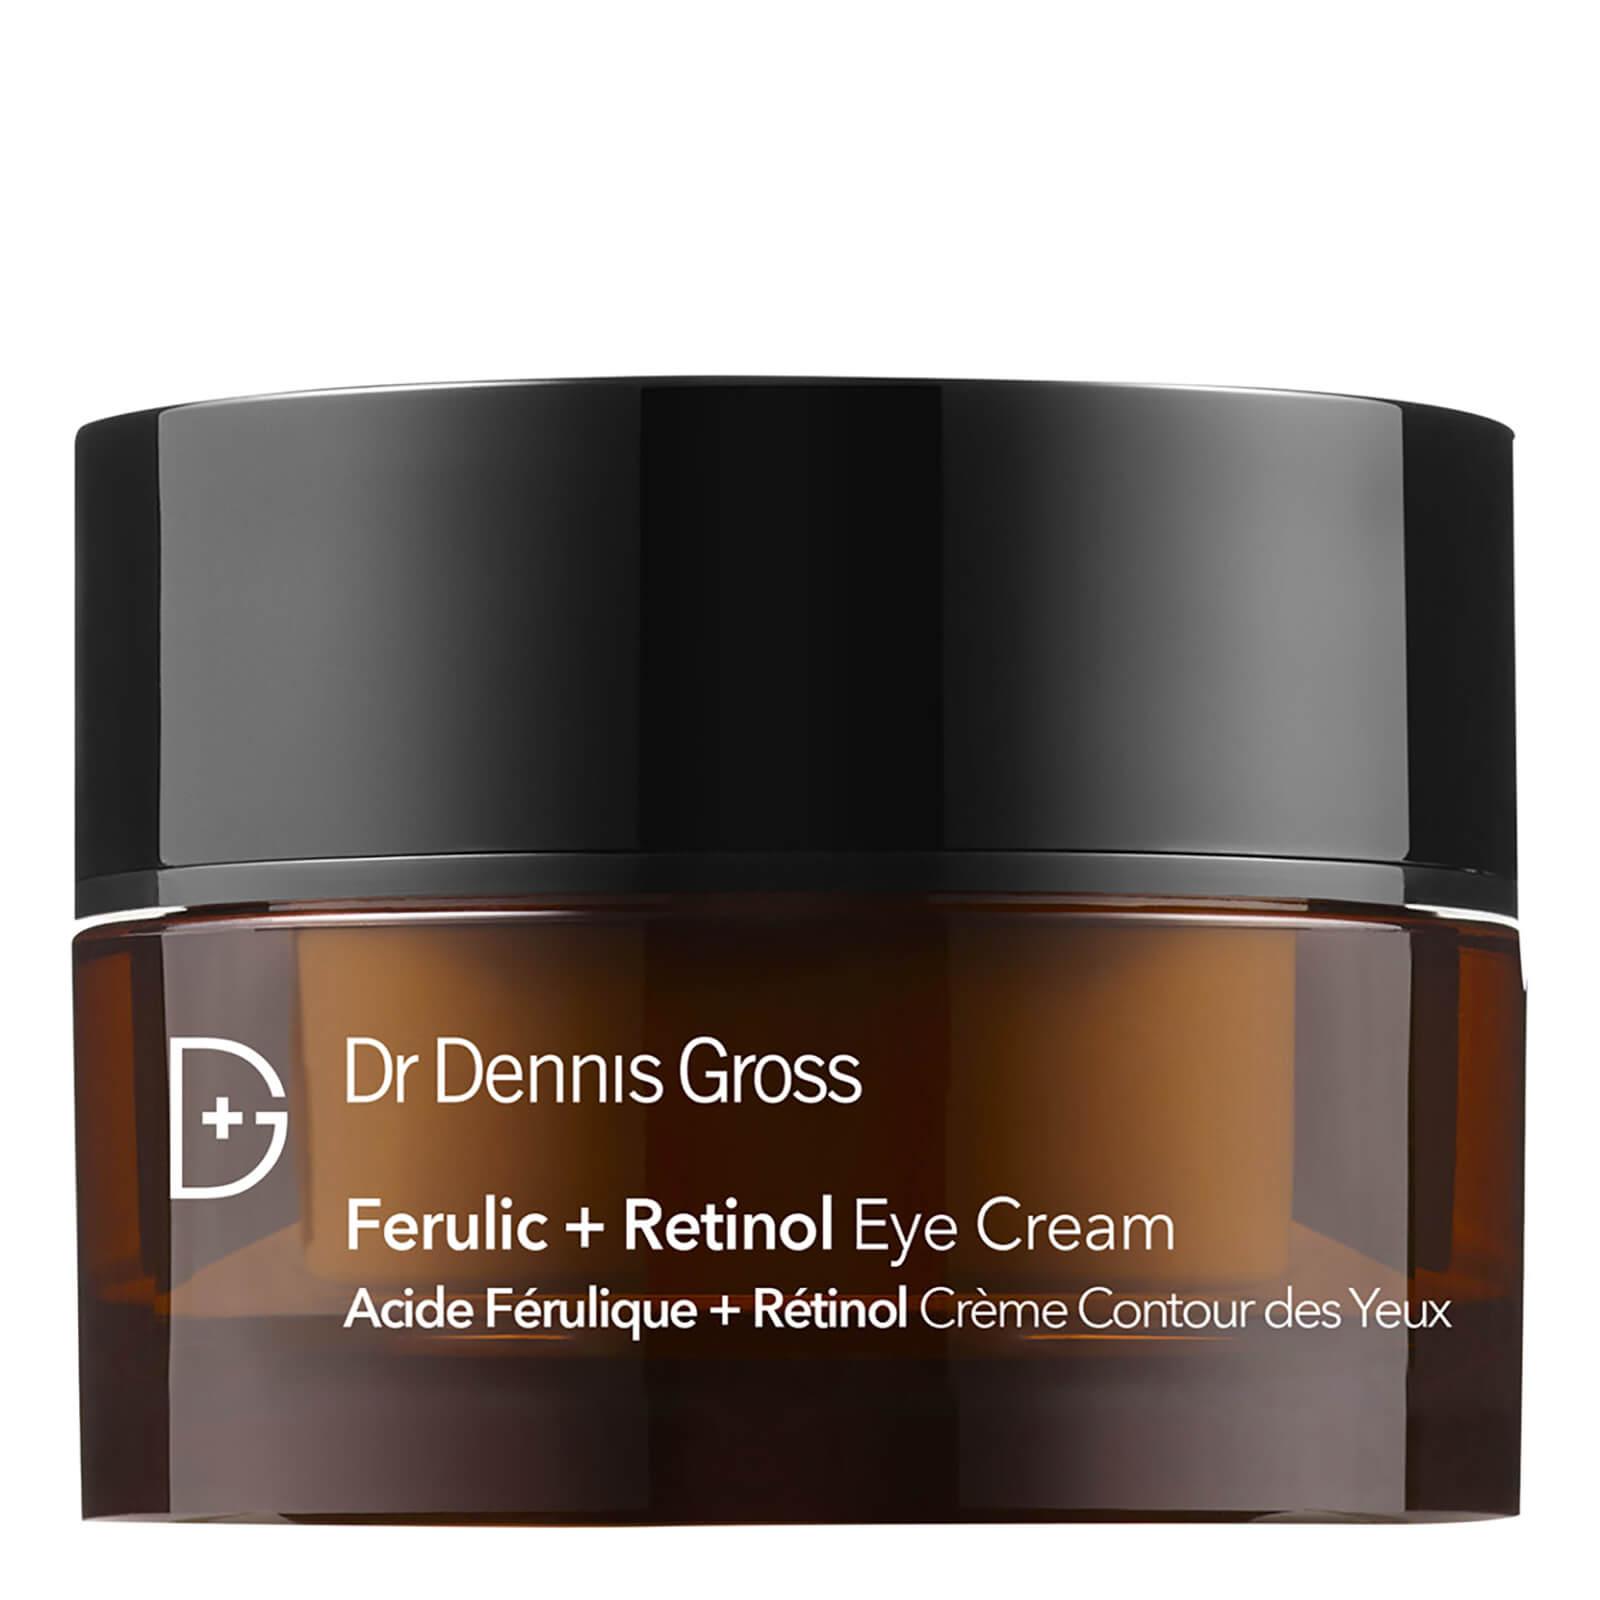 Dr Dennis Gross >> Dr Dennis Gross Skincare Ferulic And Retinol Eye Cream 15ml Free